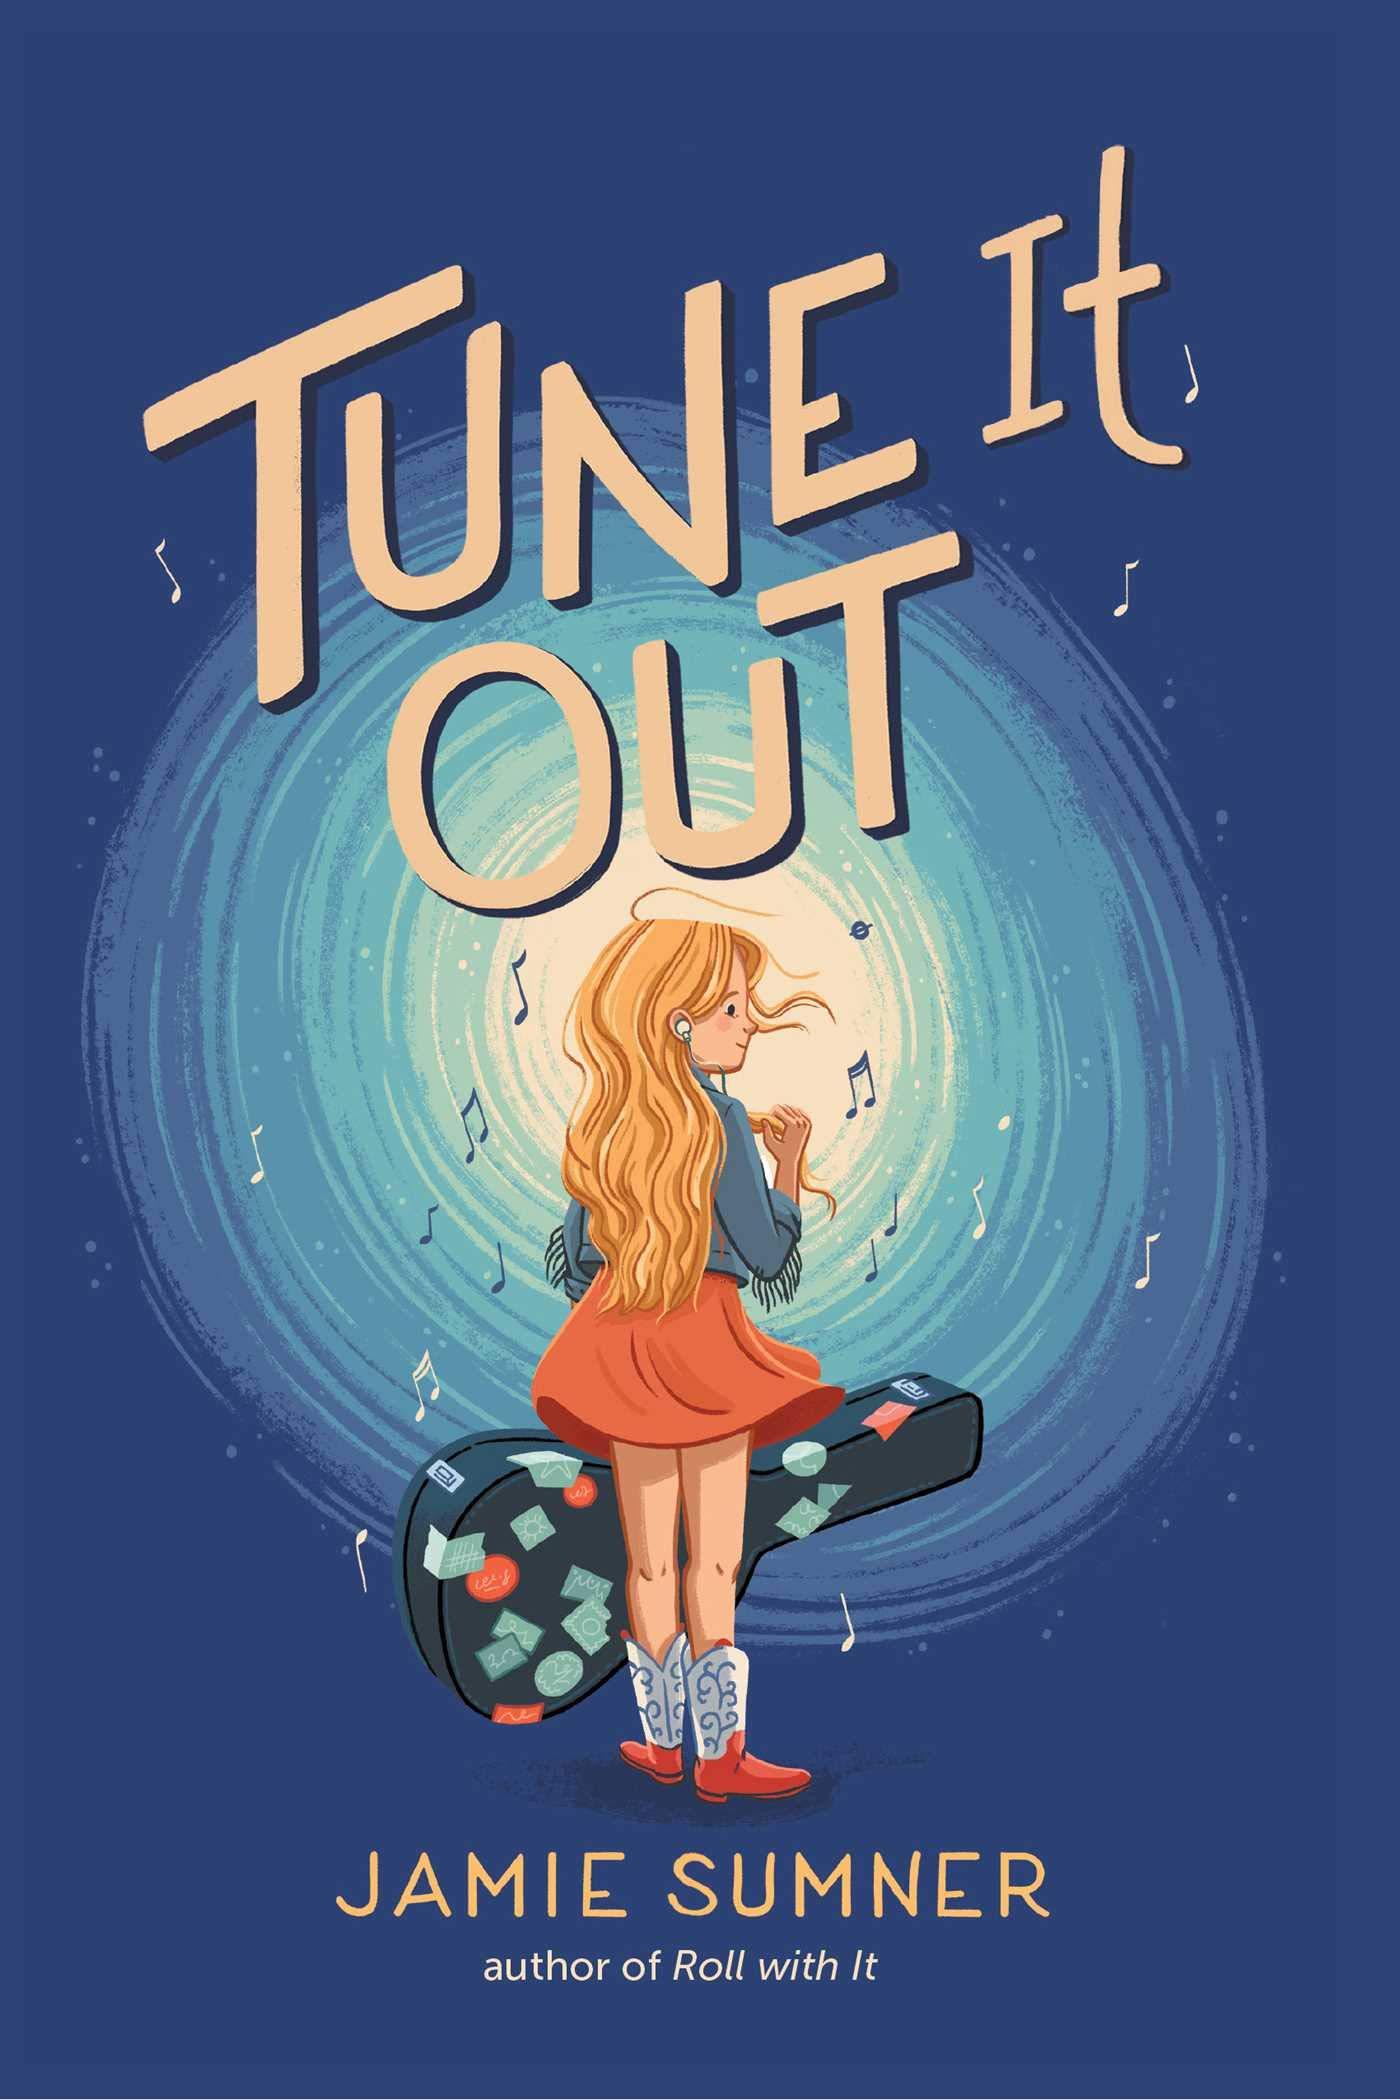 Amazon.com: Tune It Out (9781534457003): Sumner, Jamie: Books